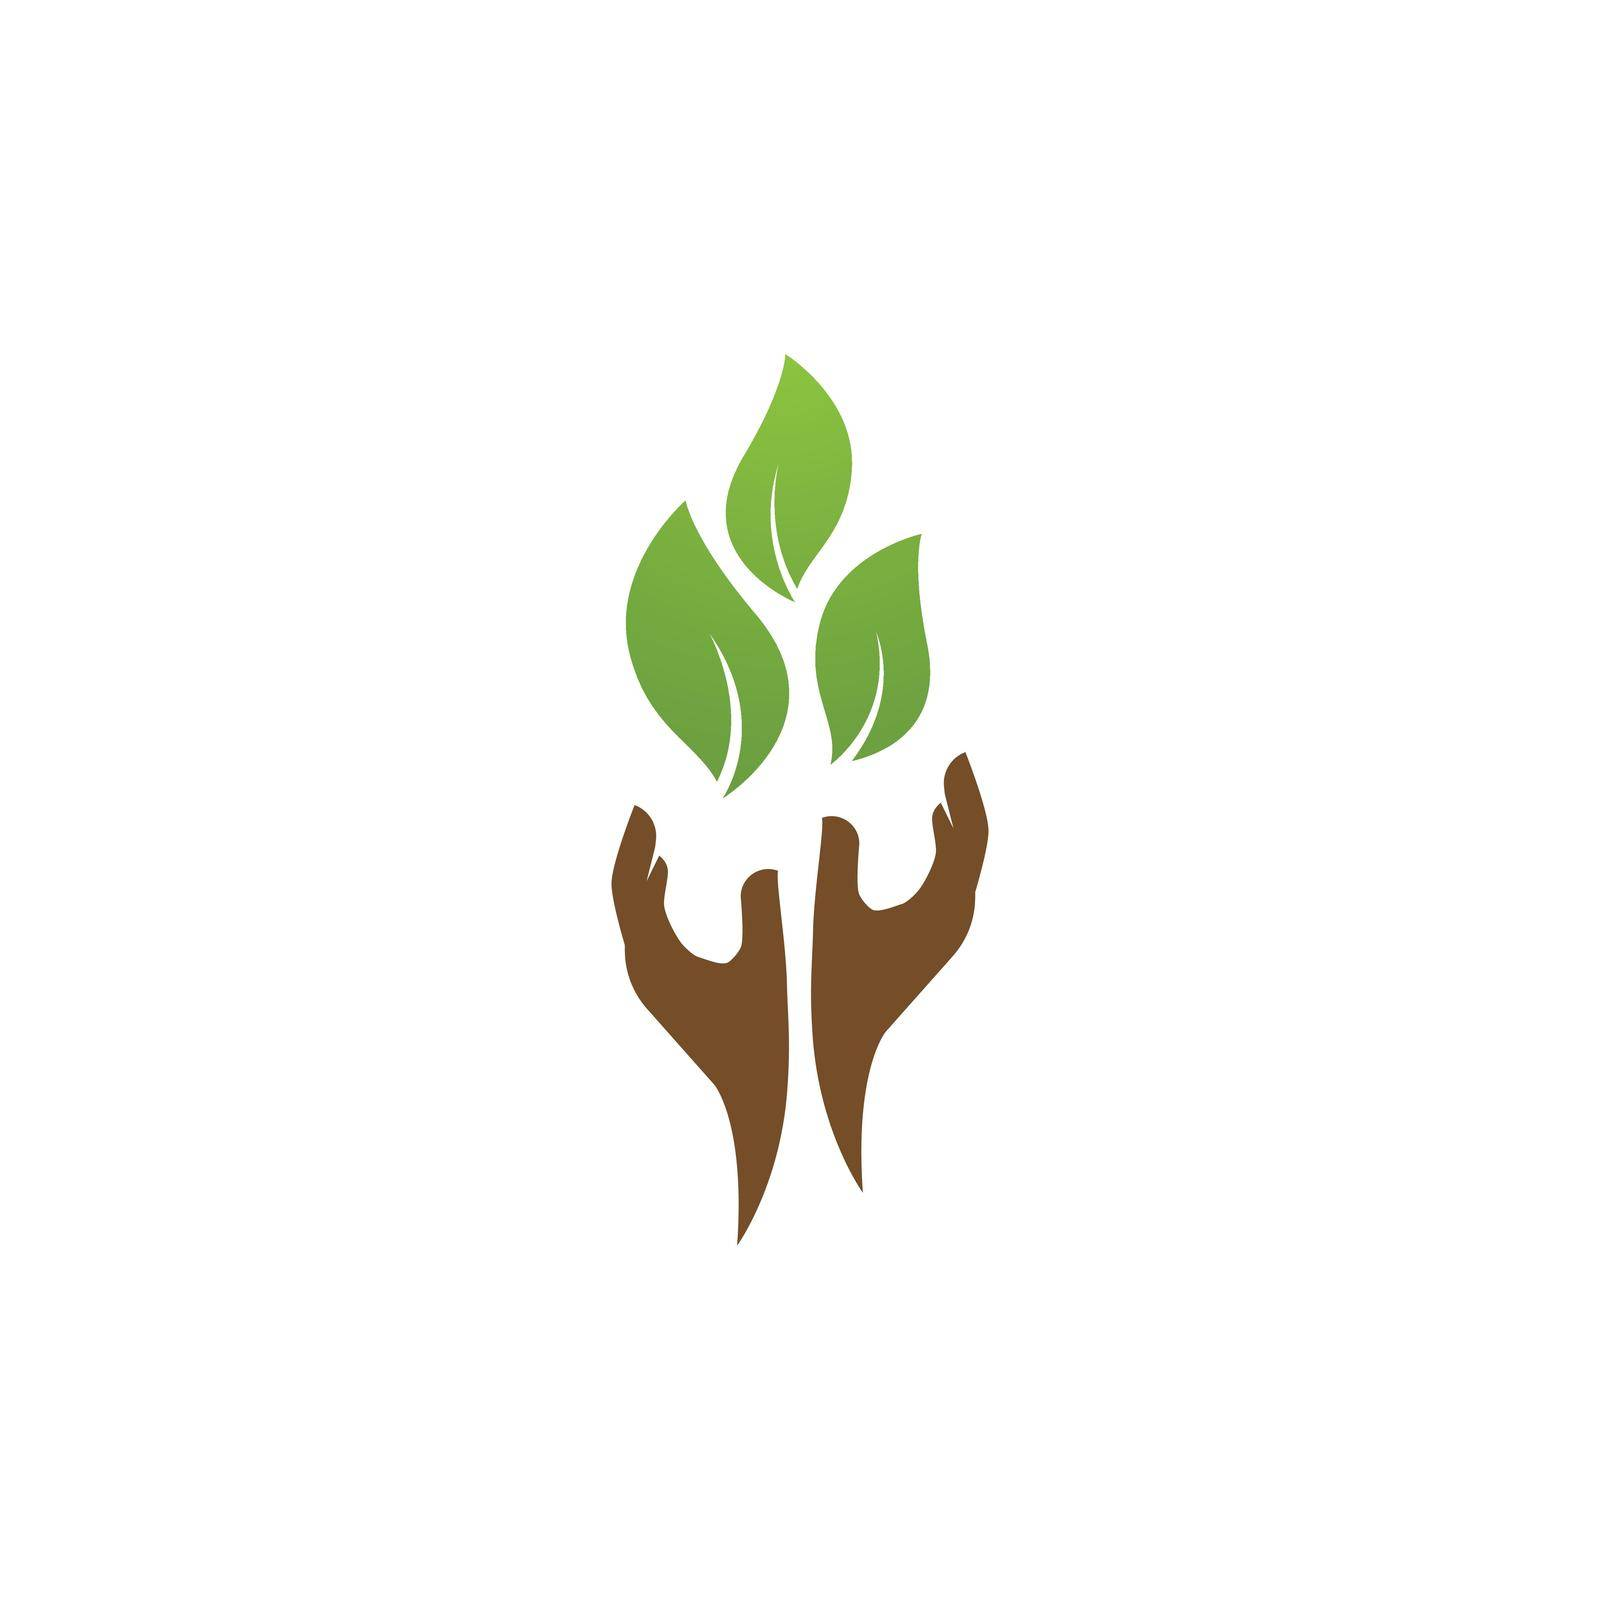 Save nature ecology logo hand and leaf illustration